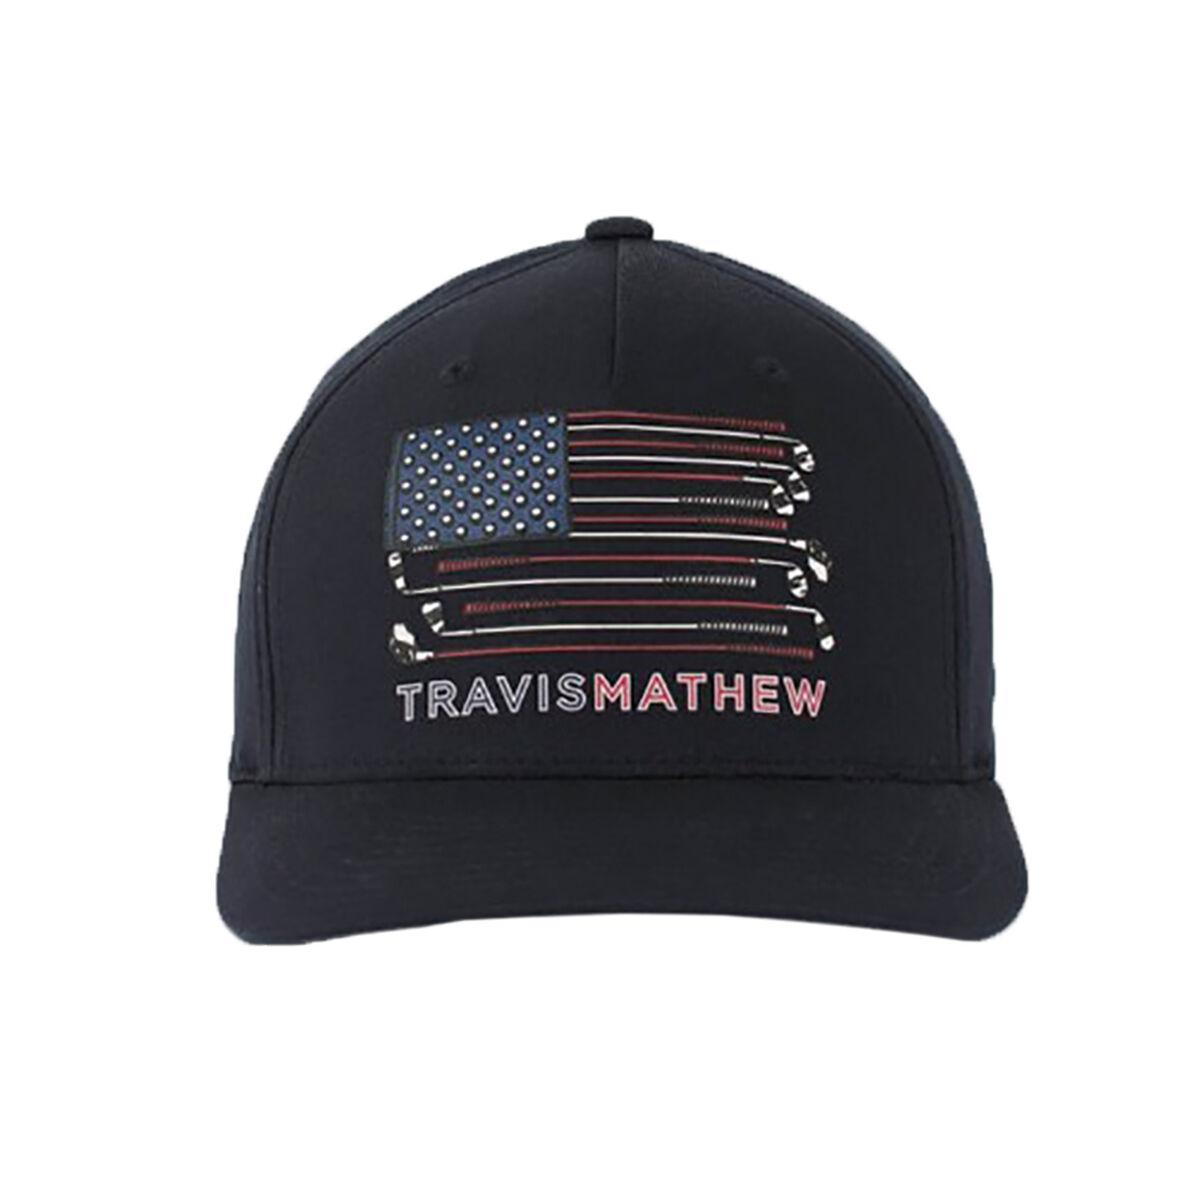 a3498825a01 Images. TravisMathew Fitzjohn Hat